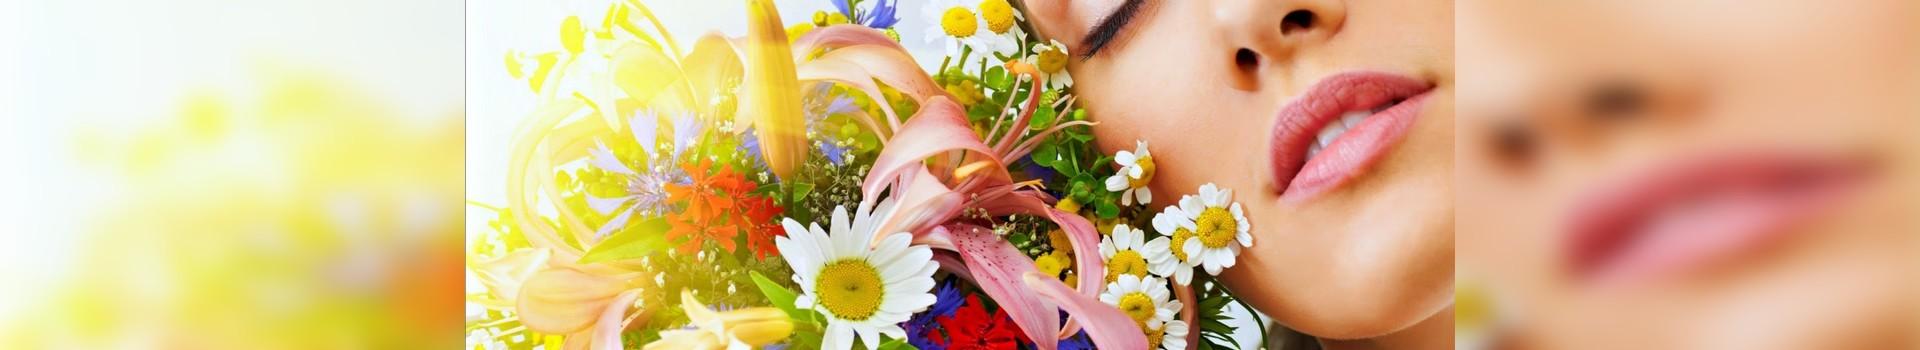 mayorista de flor cortada en san sebastian de los reyes, mayorista de flor cortada en zona norte